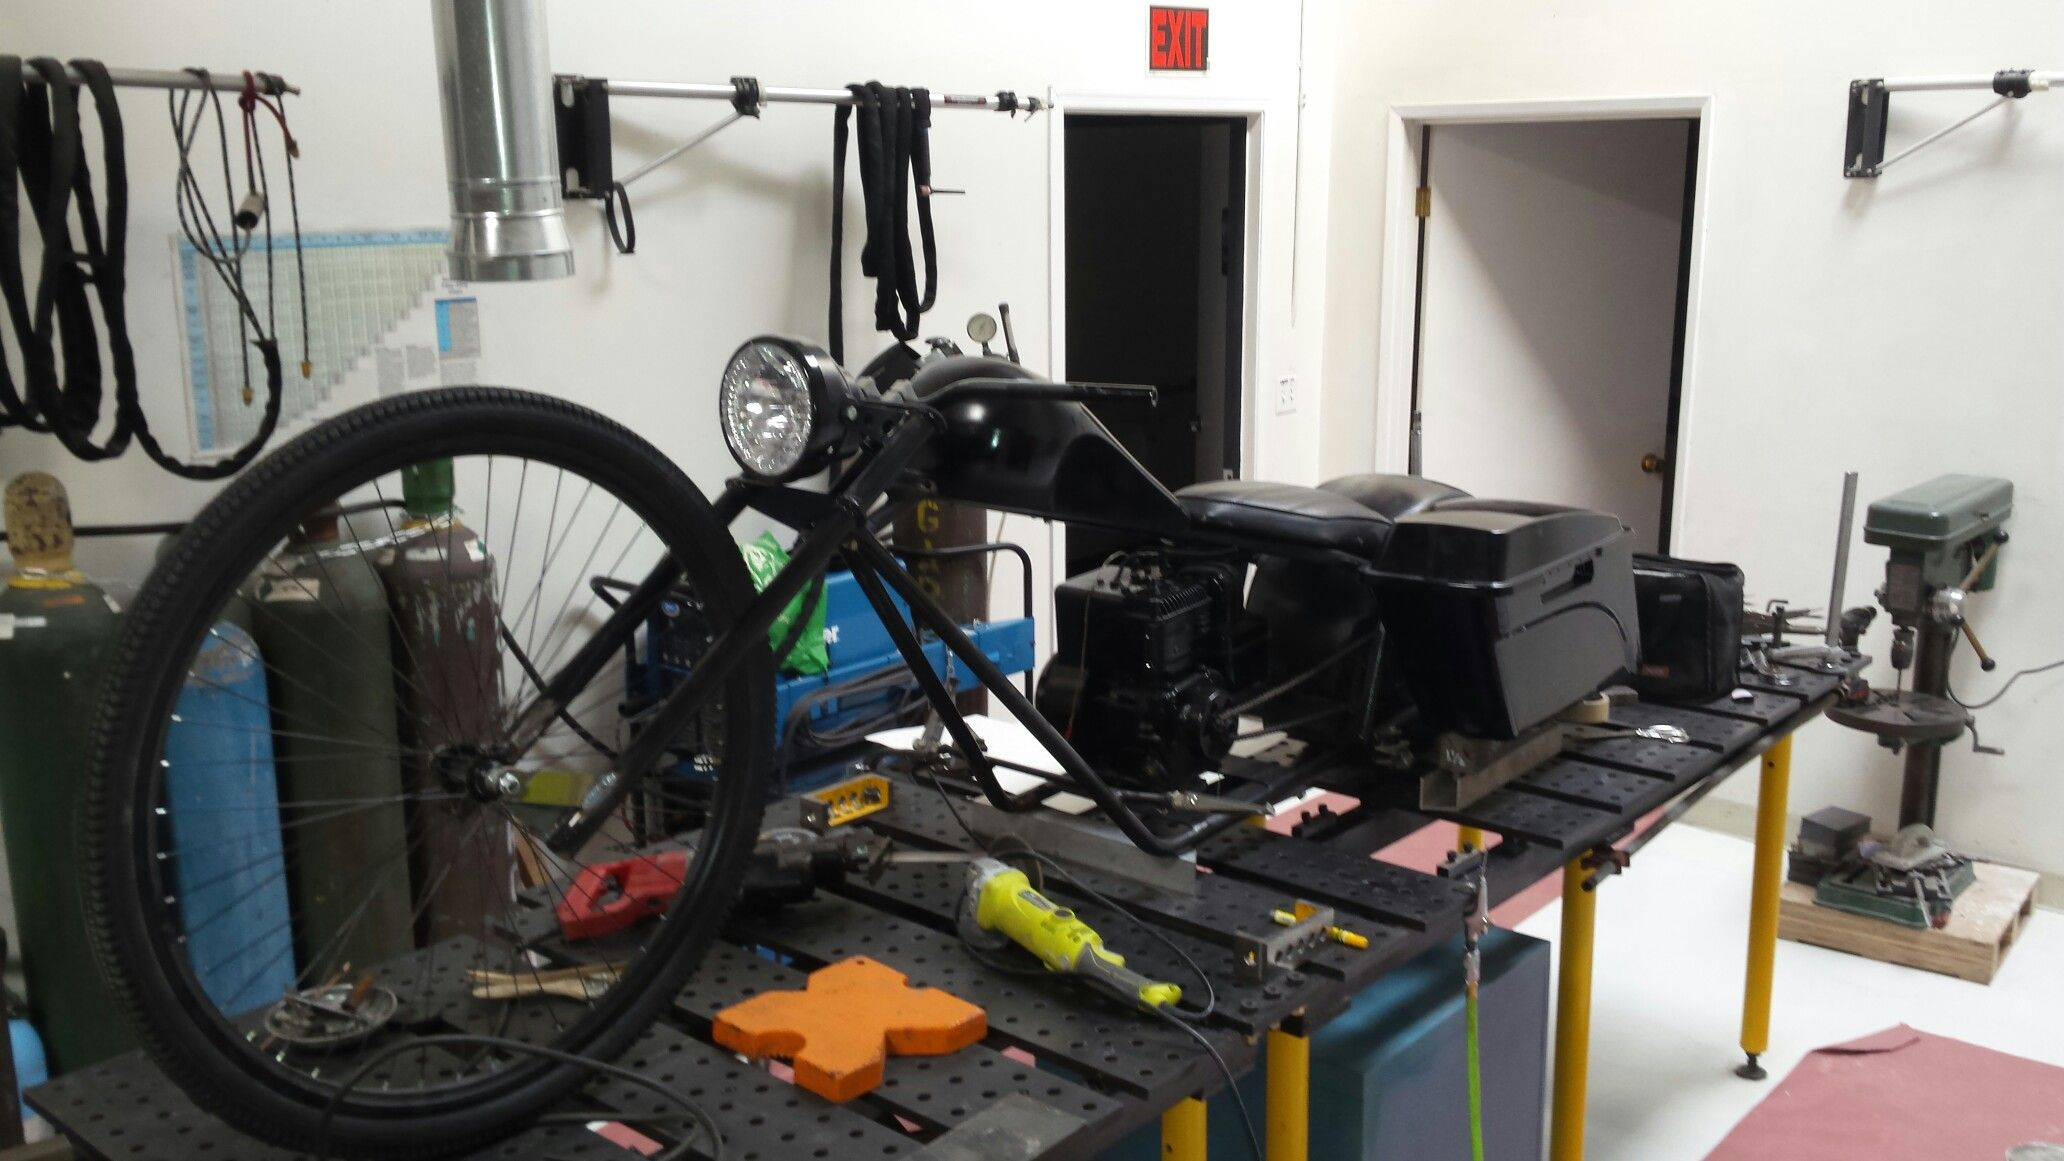 Berühmt Mini bagger mini bike build | baggers | Mini bike, Bike, Bicycle @MH_68